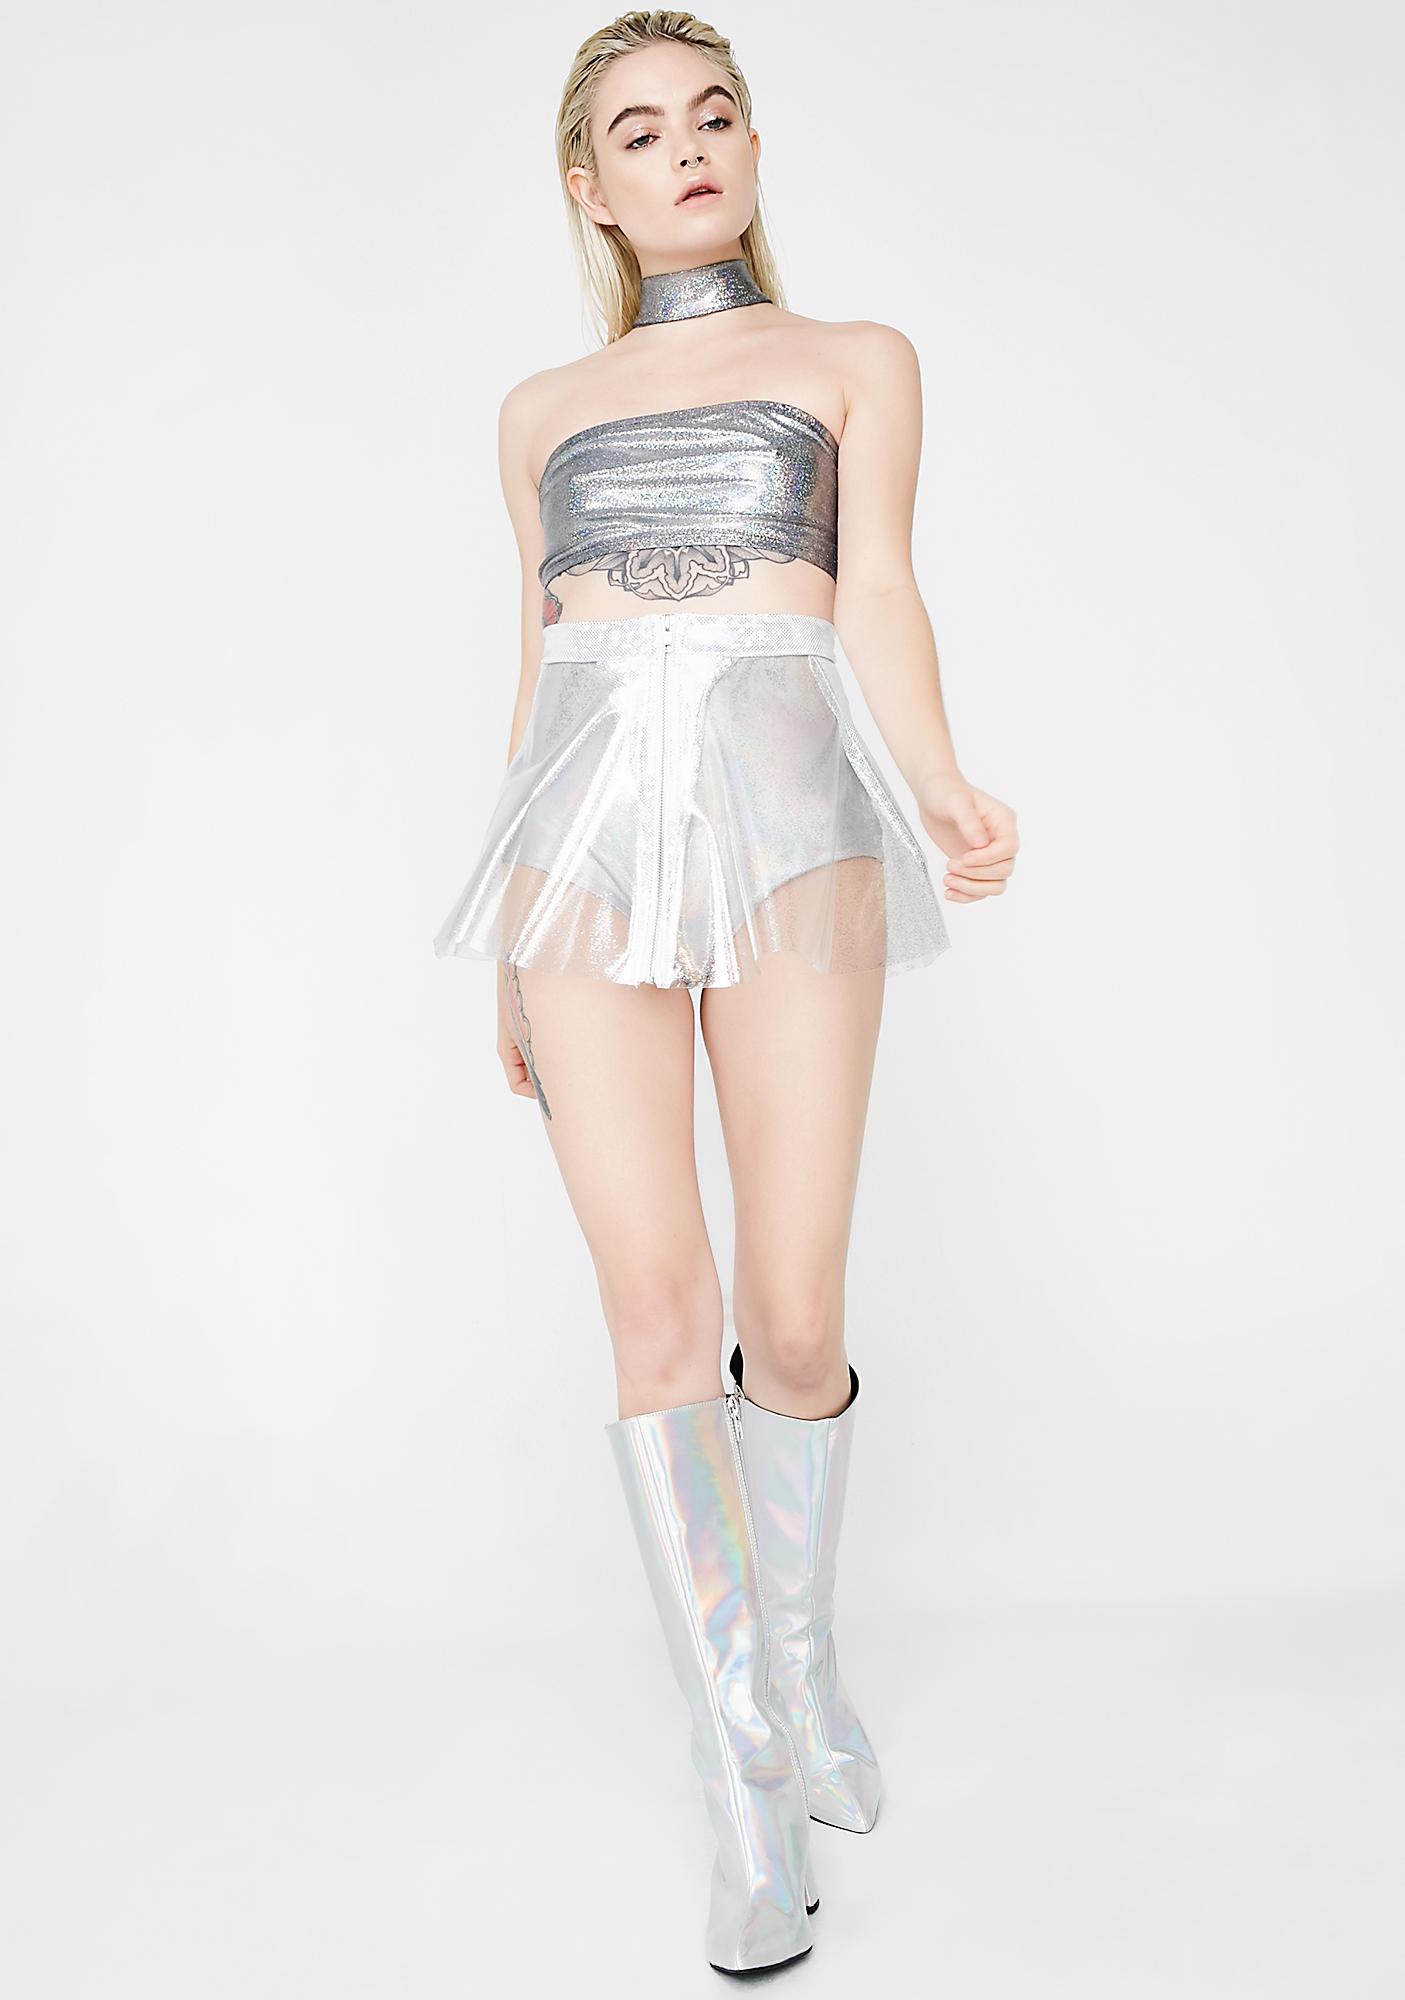 J Valentine Sparkle Clear Vinyl Skirt